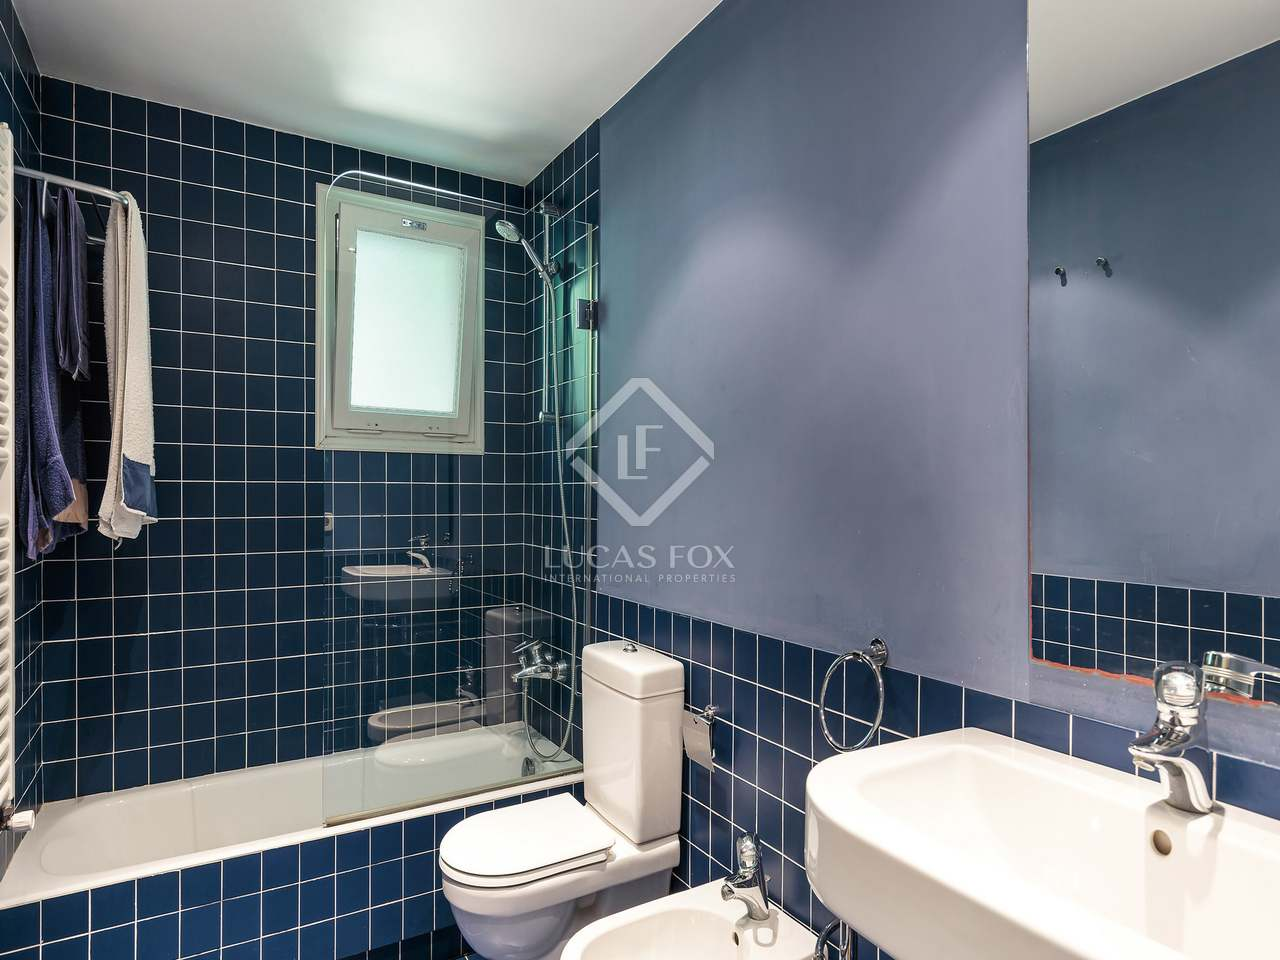 266m haus villa zum verkauf in llafranc calella tamariu. Black Bedroom Furniture Sets. Home Design Ideas